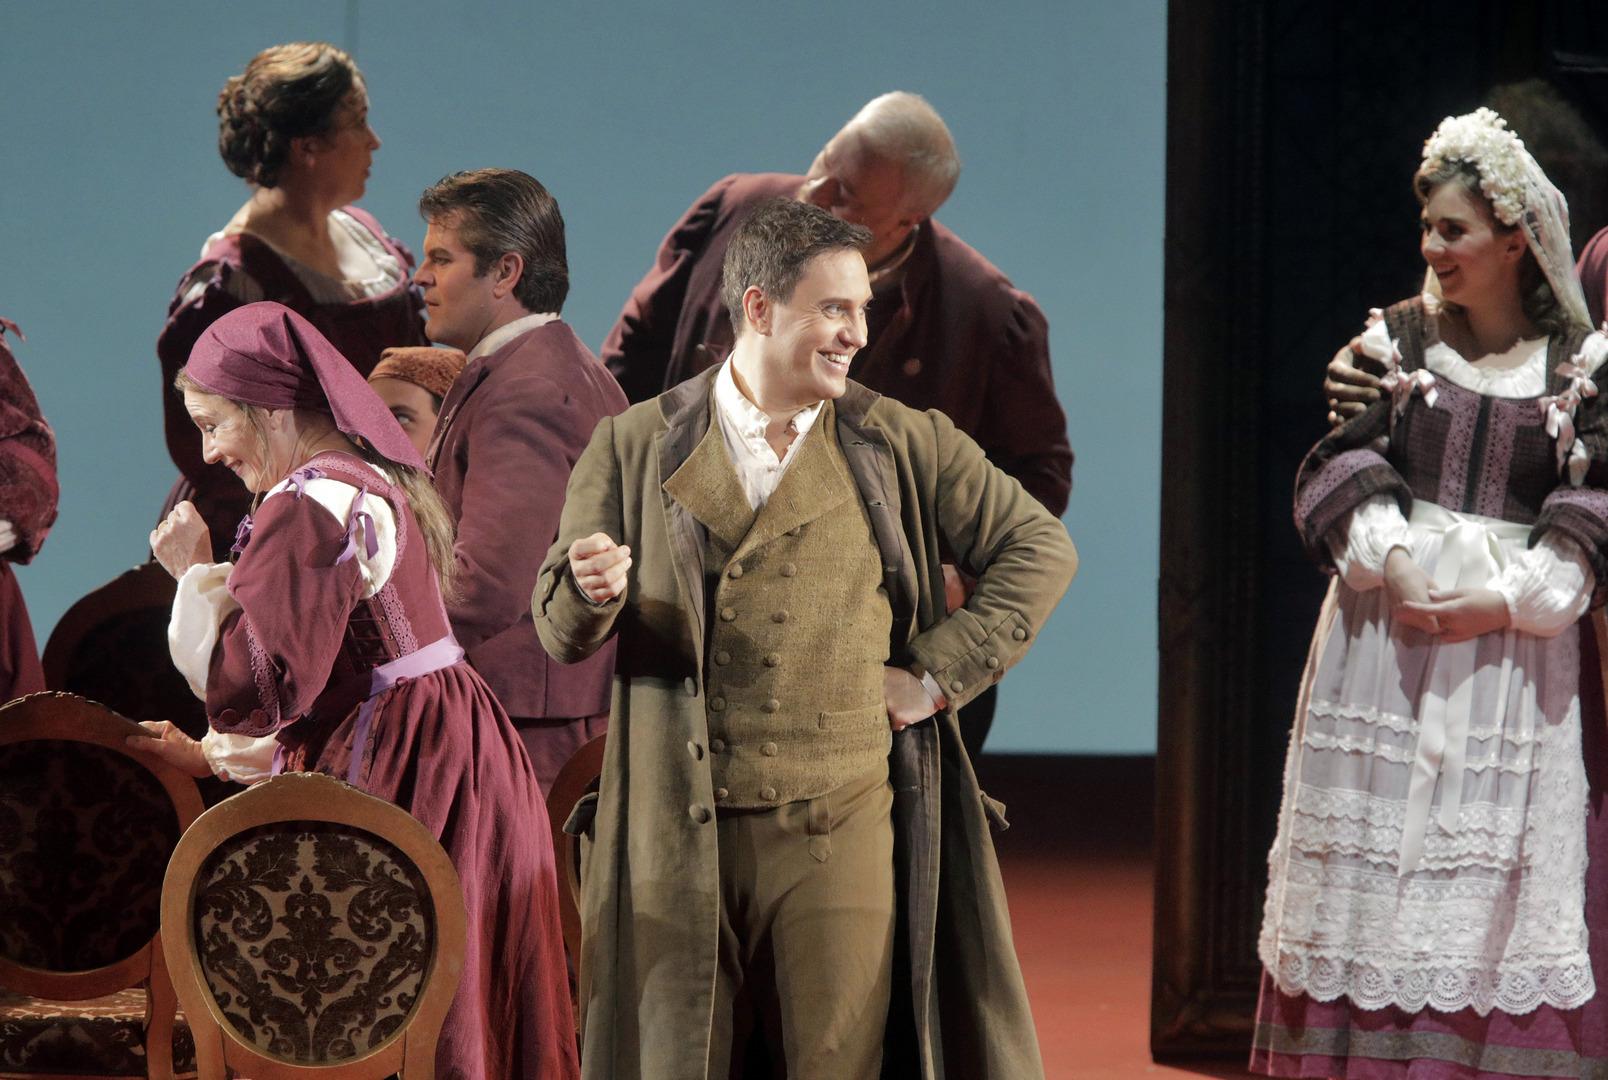 Opera-Director-Jacopo-Spirei-Don-Giovanni-Opera-by-Mozart-San-Francisco-2017-7